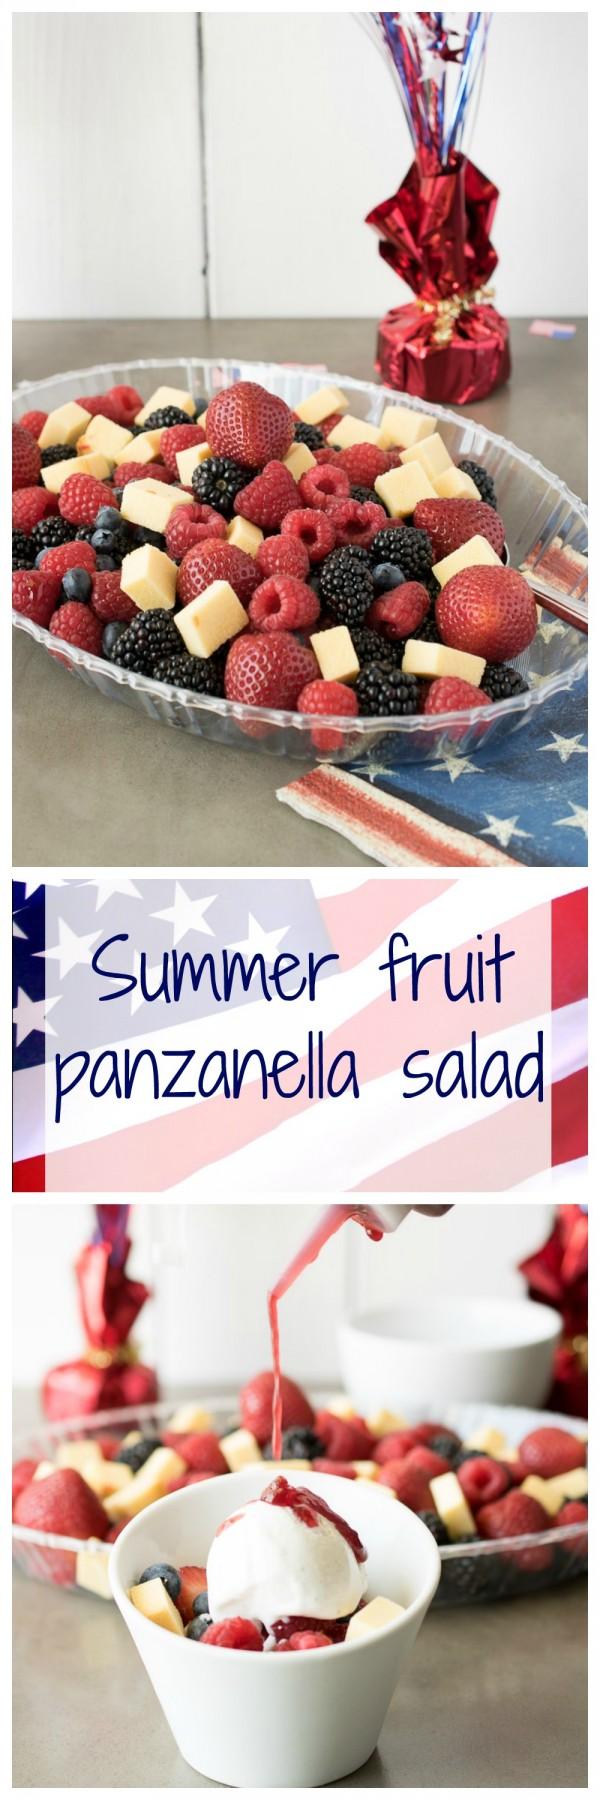 Summer fruit panzanella salad